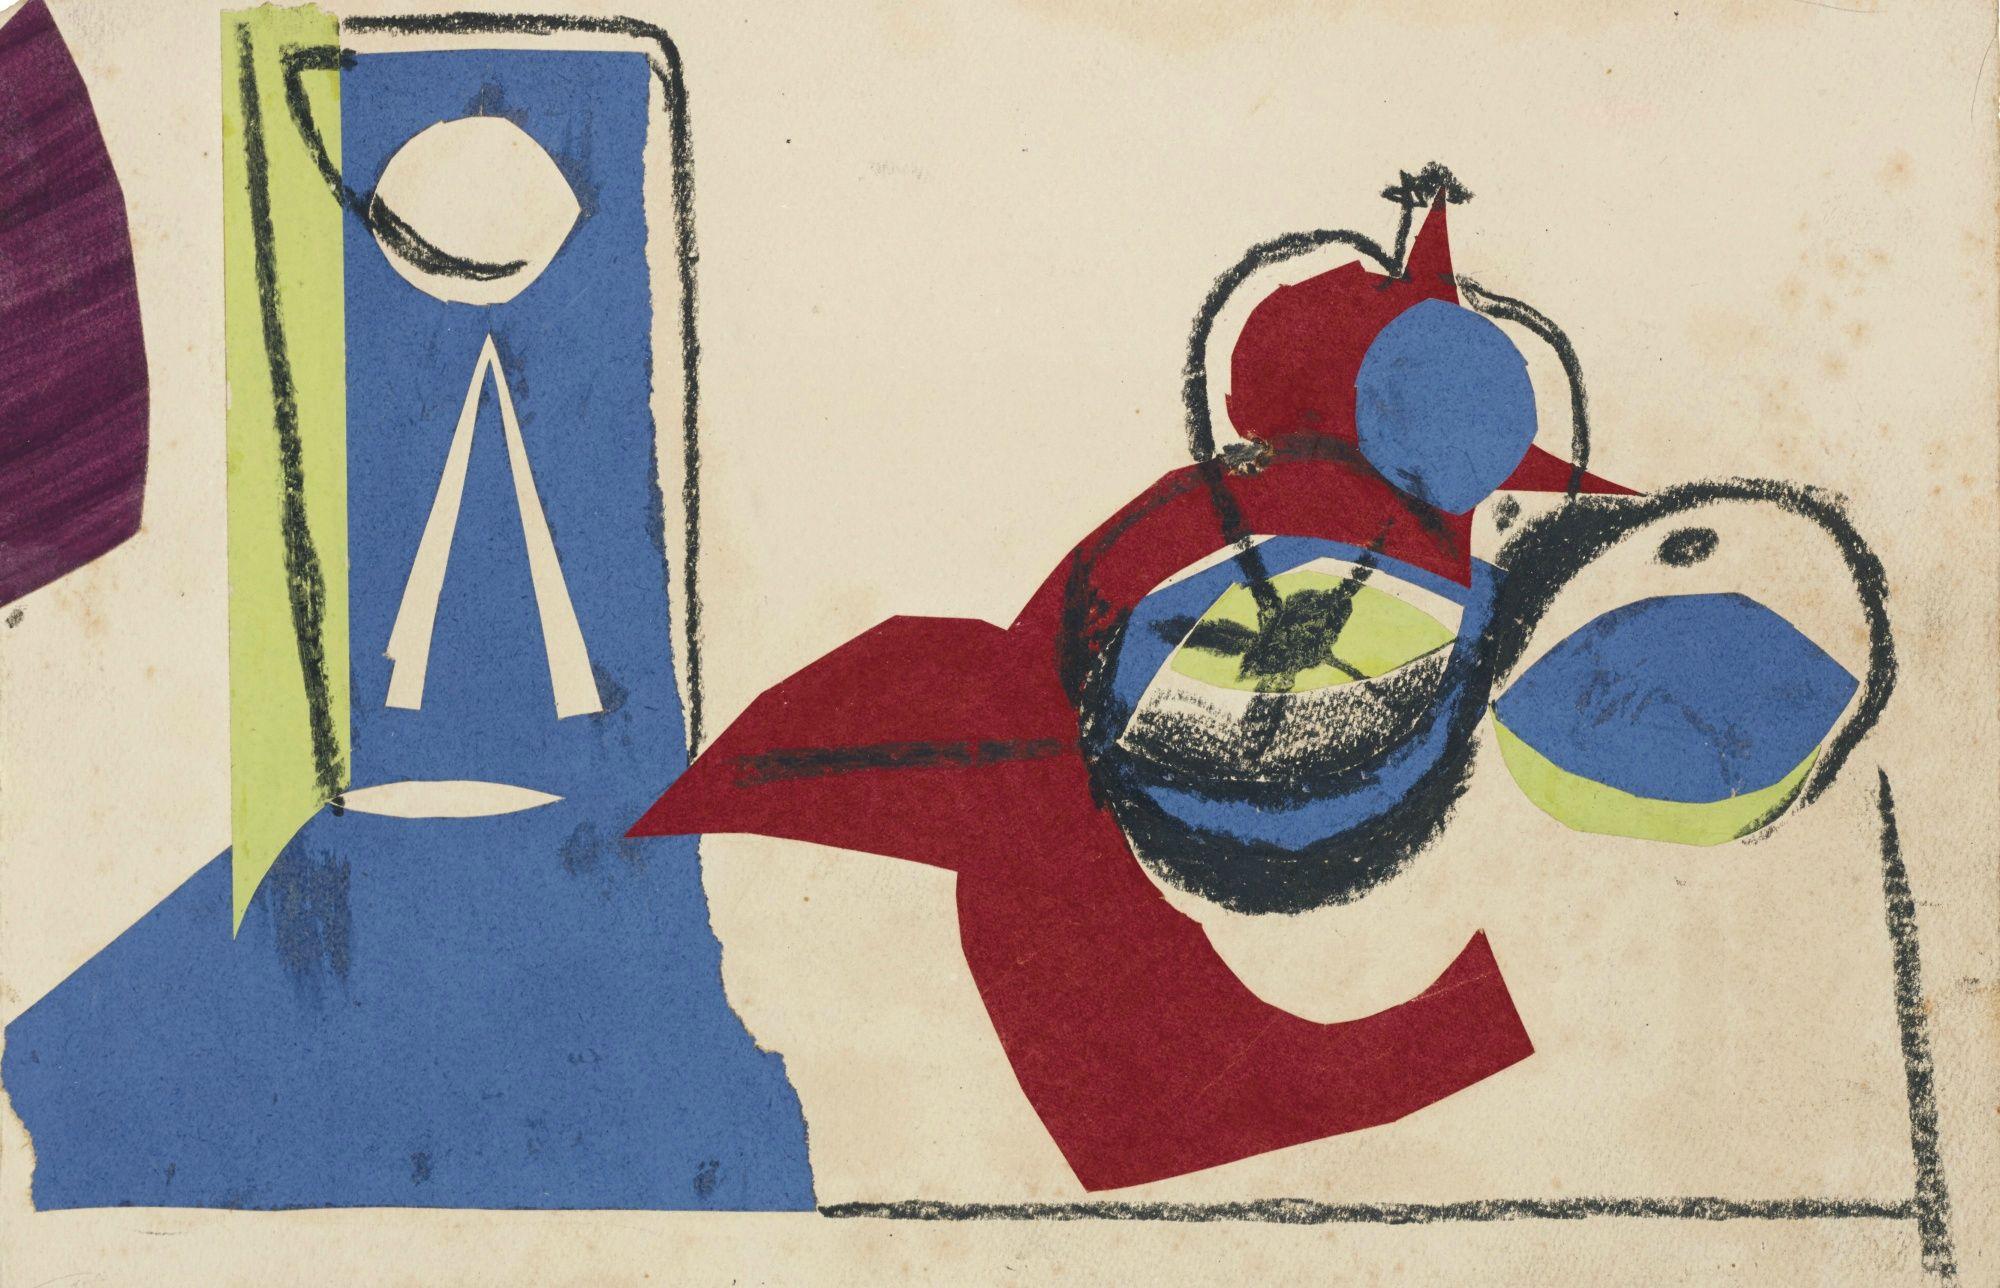 Pablo Picasso - Nature morte aux fruits, dated Dimanche 18 novembre ...